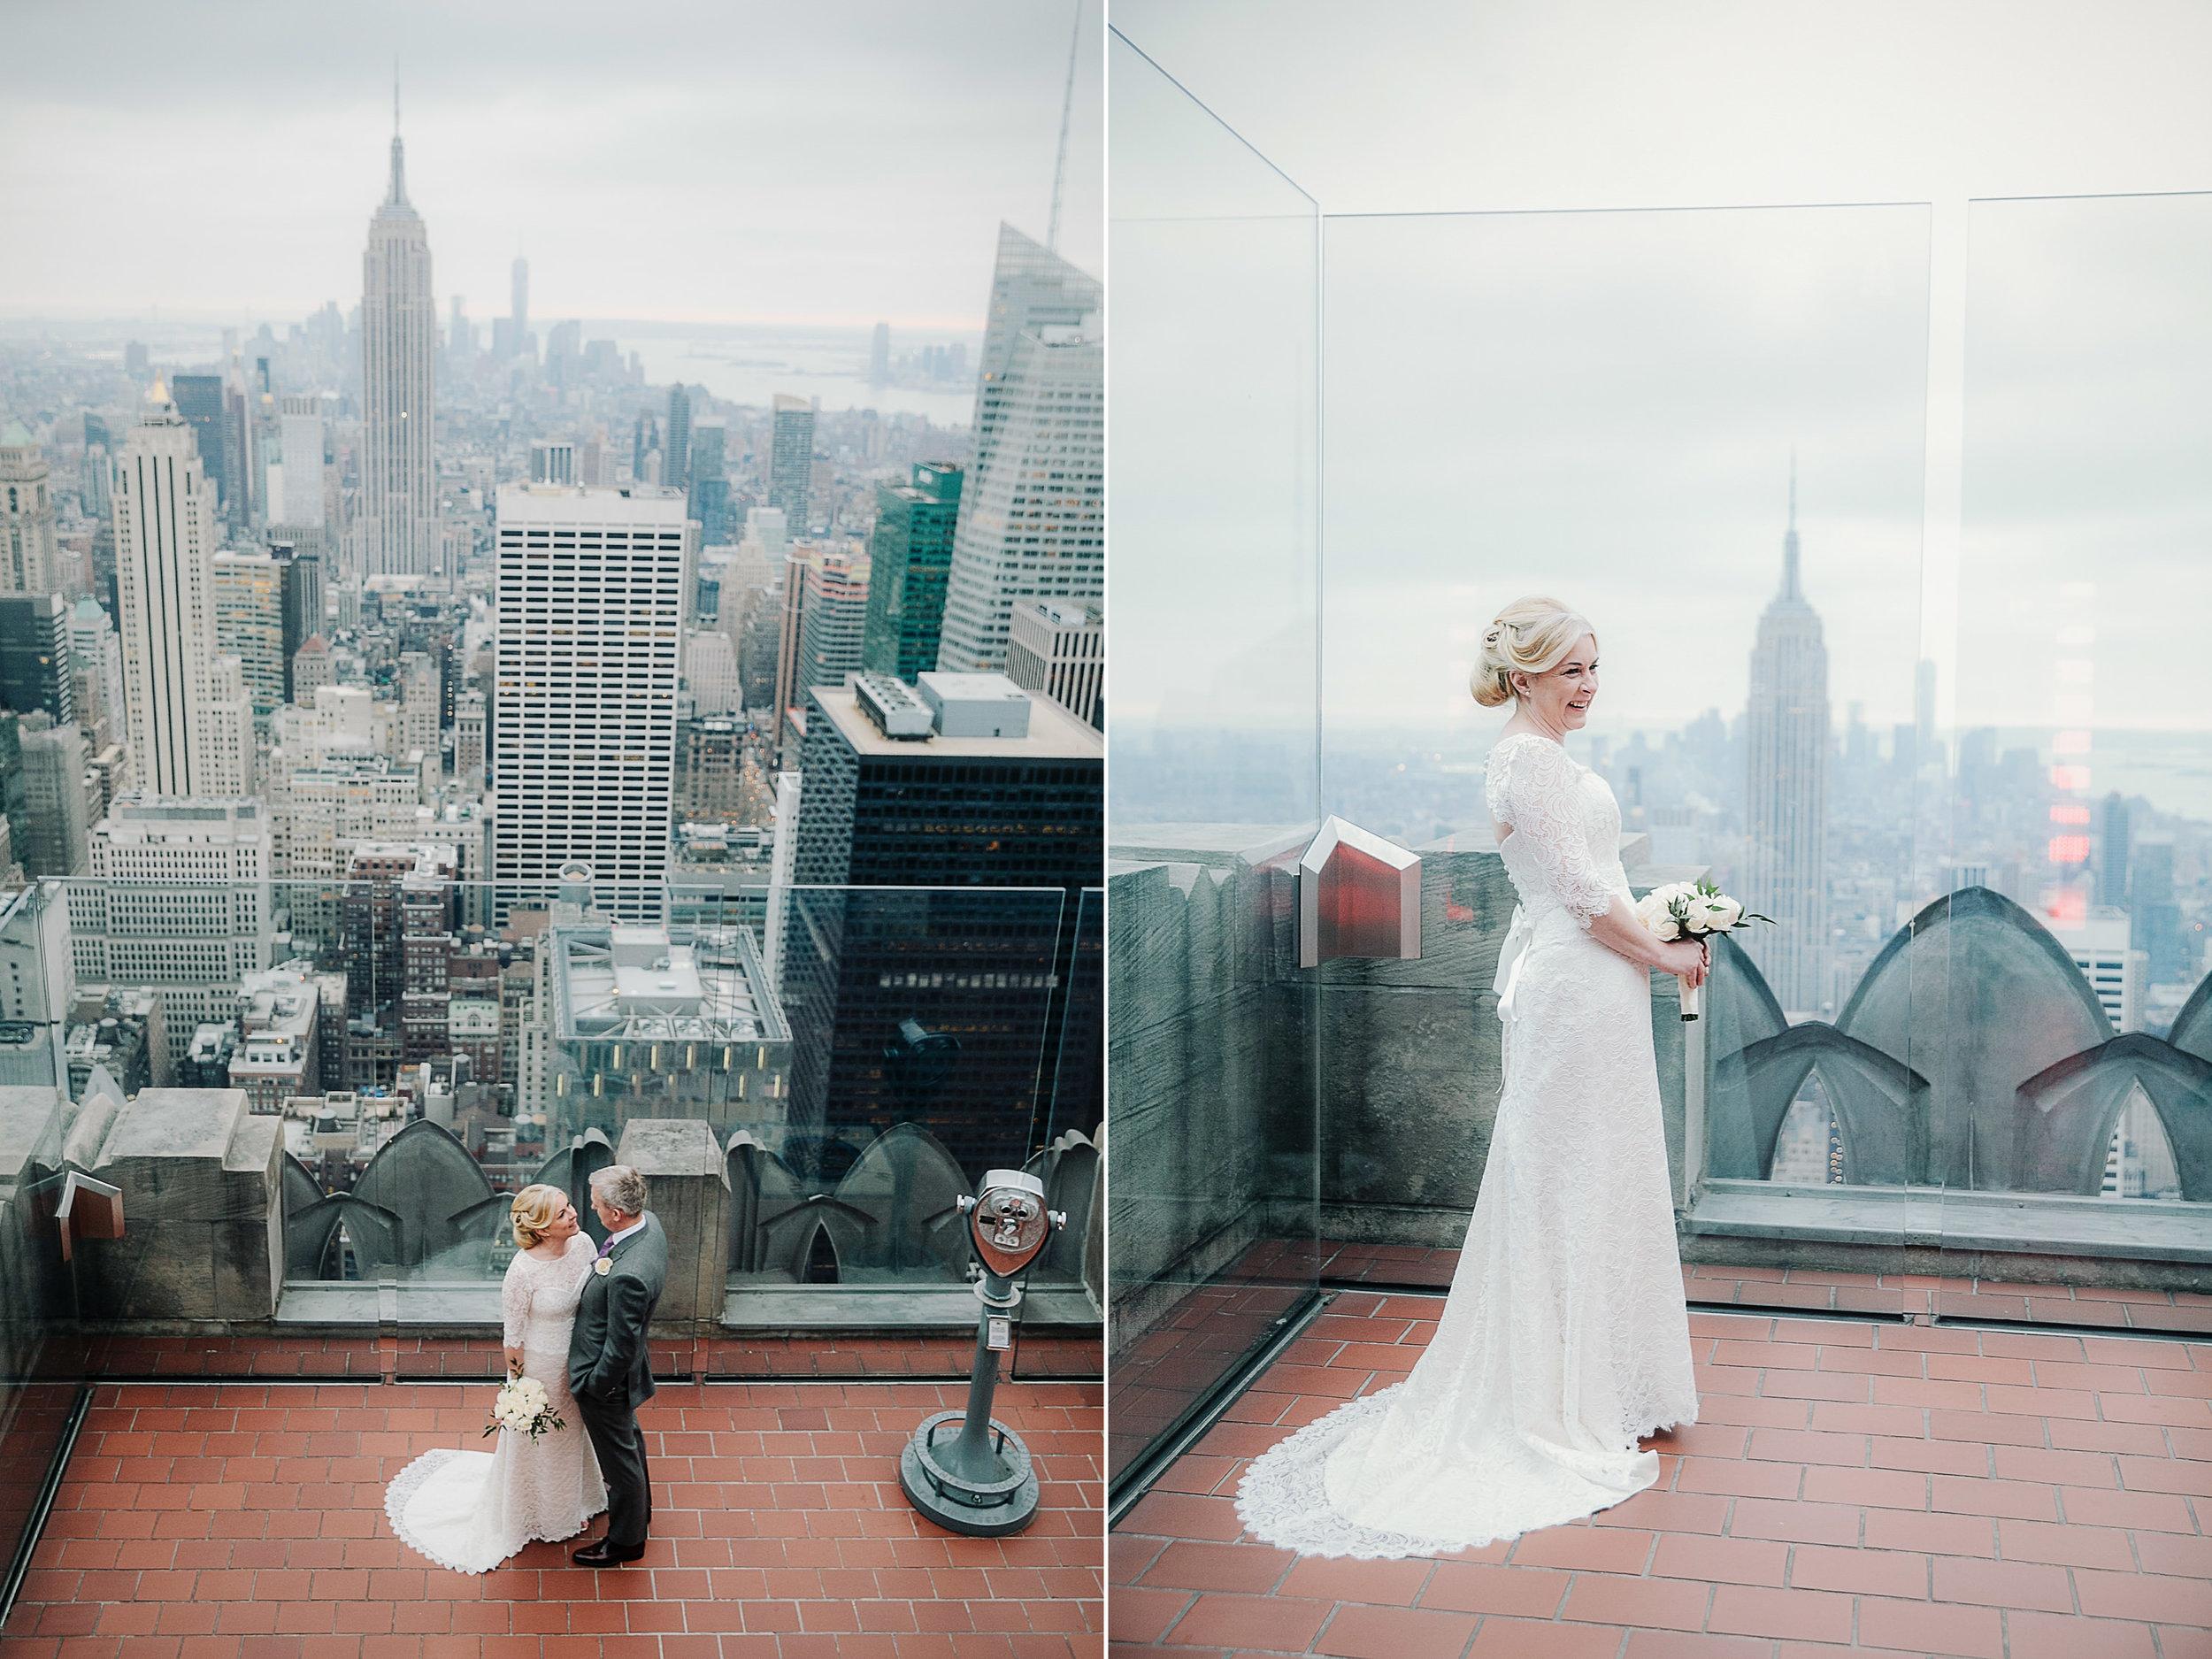 S&B_fourseasons_hotel_nyc_elopement_15.jpg